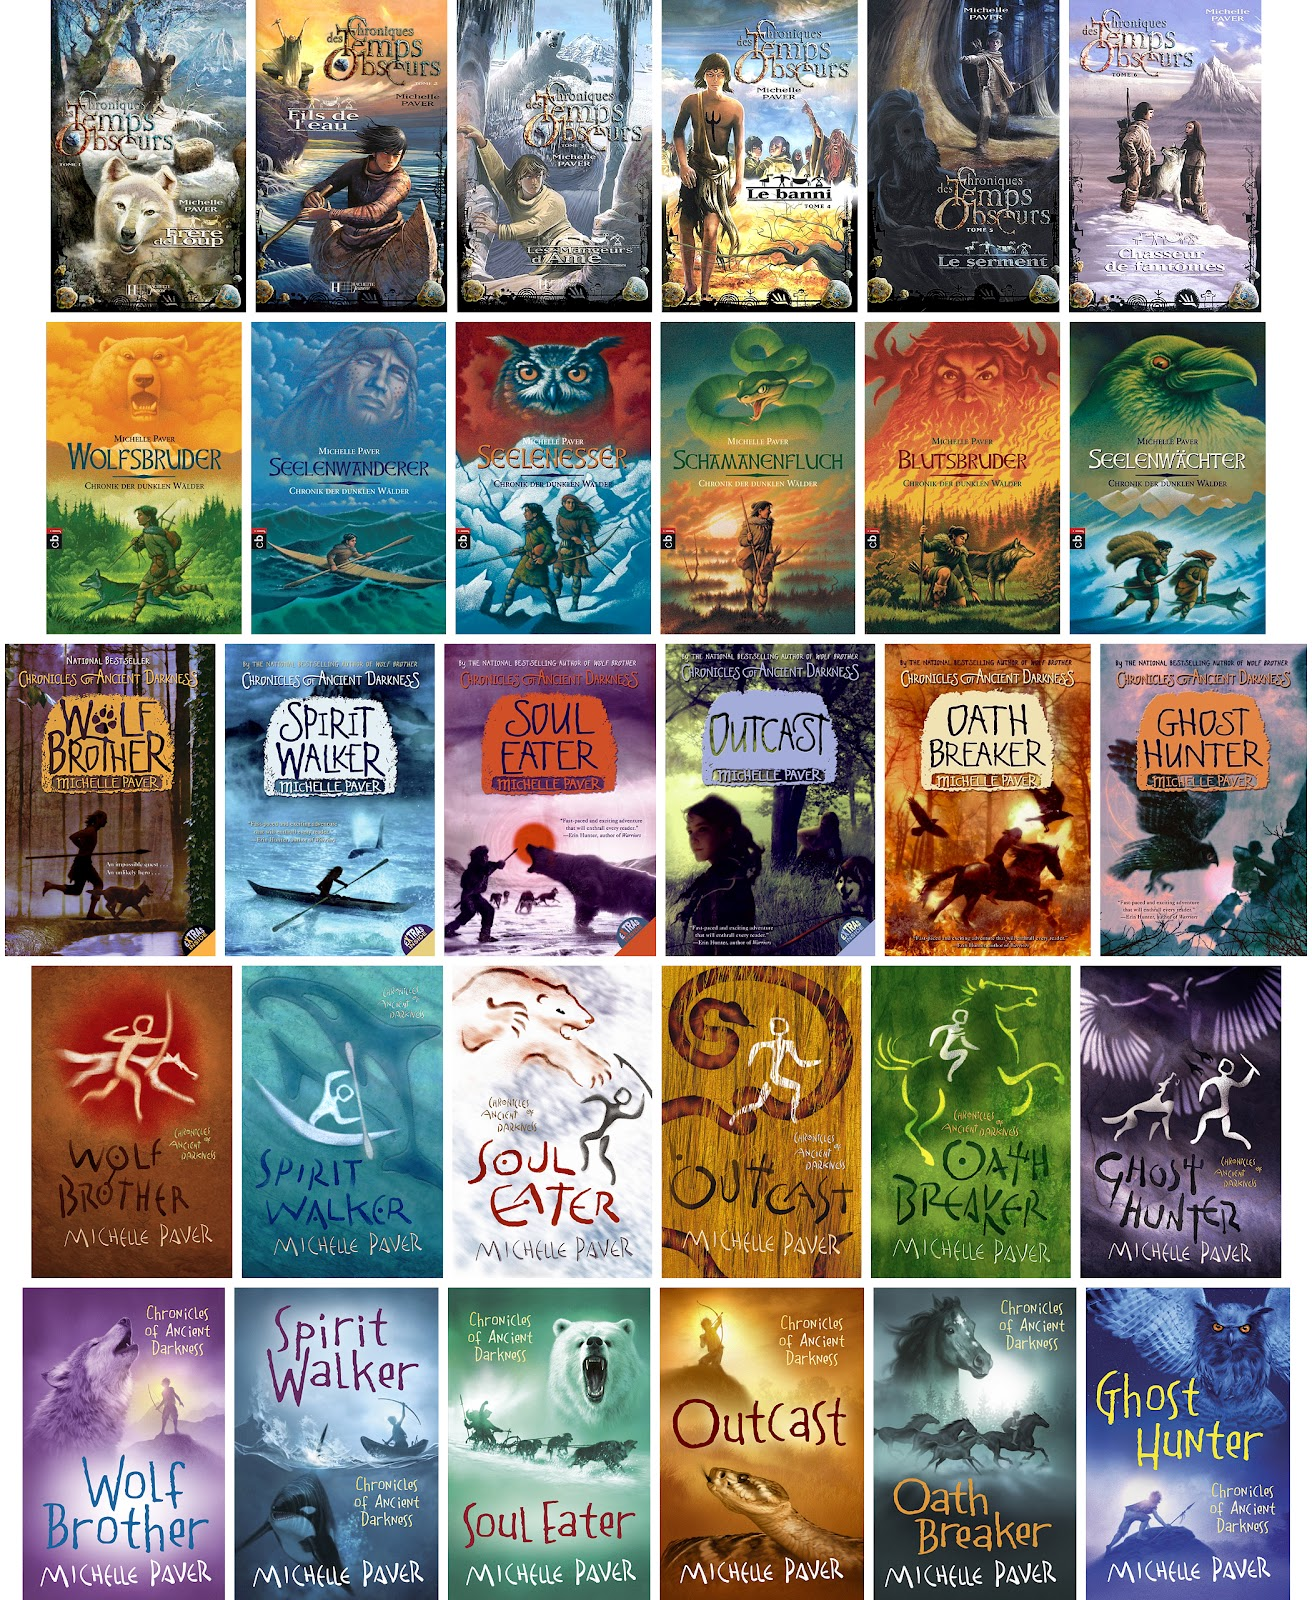 My Imagination: My Top 10 Of Favorite Fantasy Series